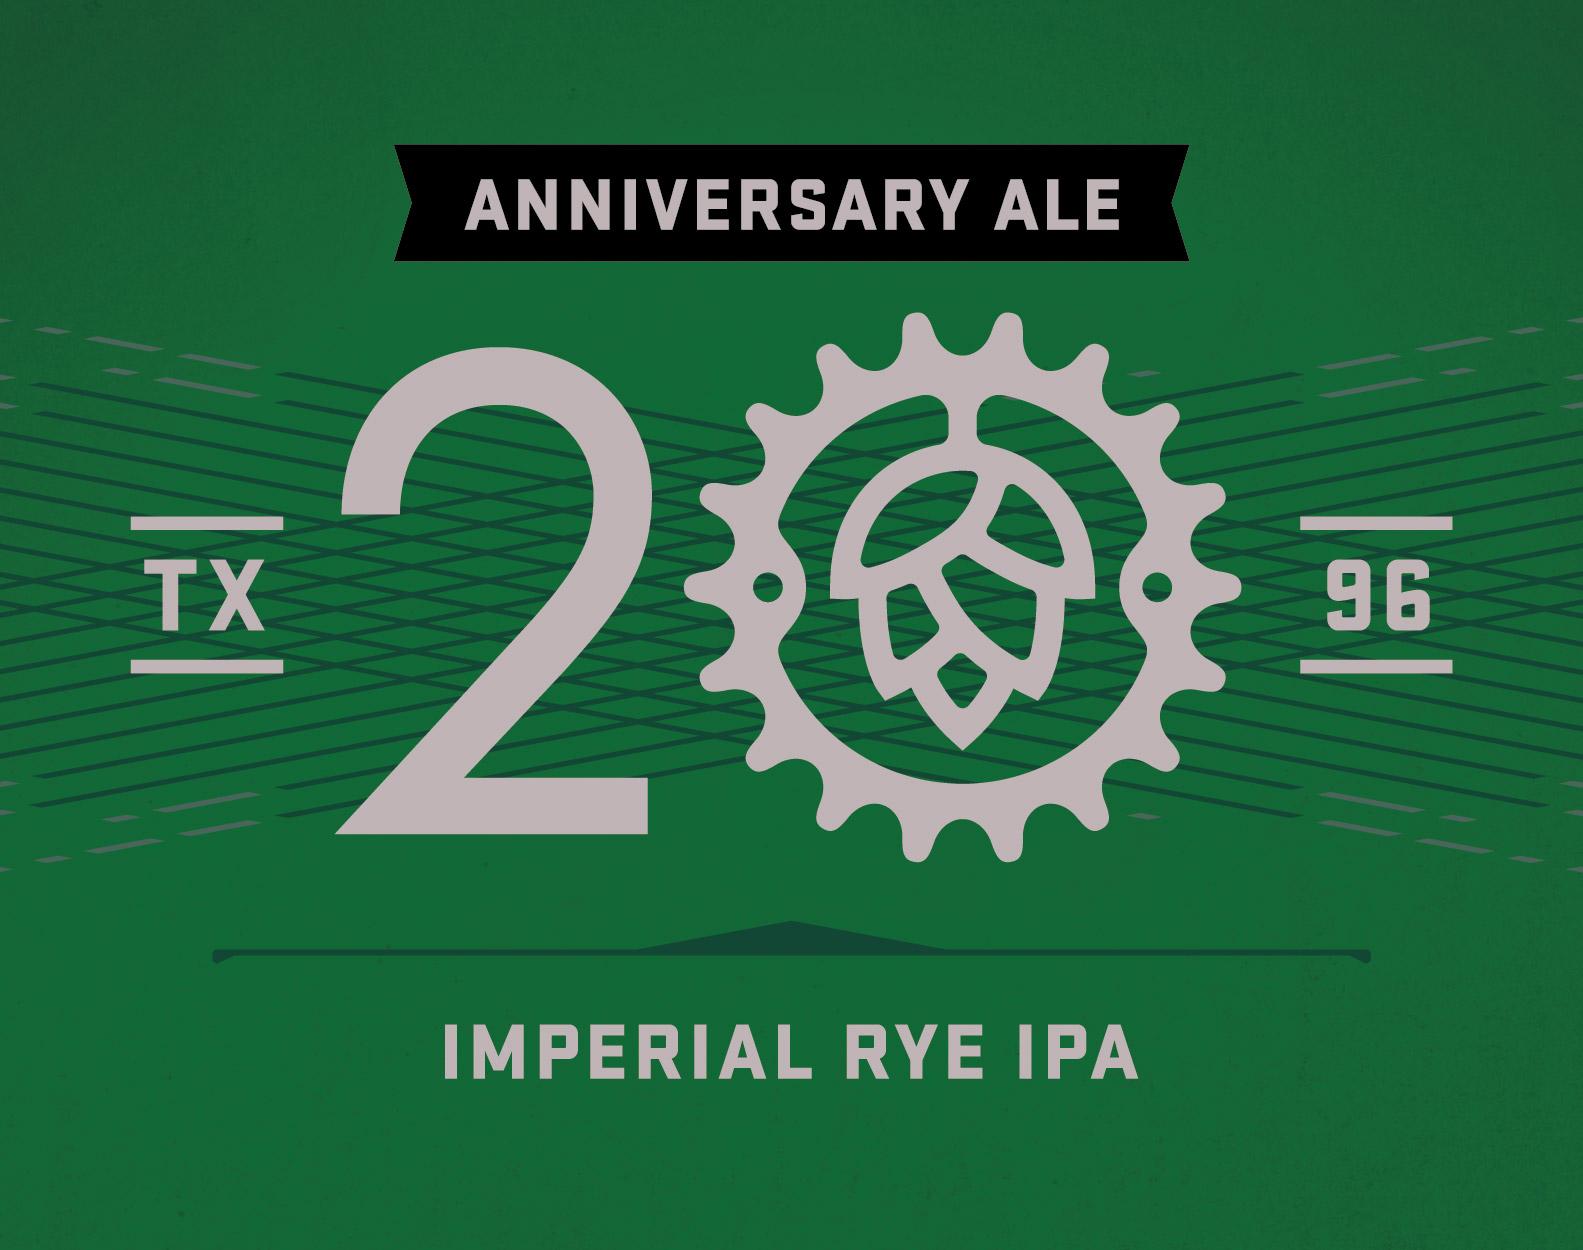 Beer_Labels_20_ANNI